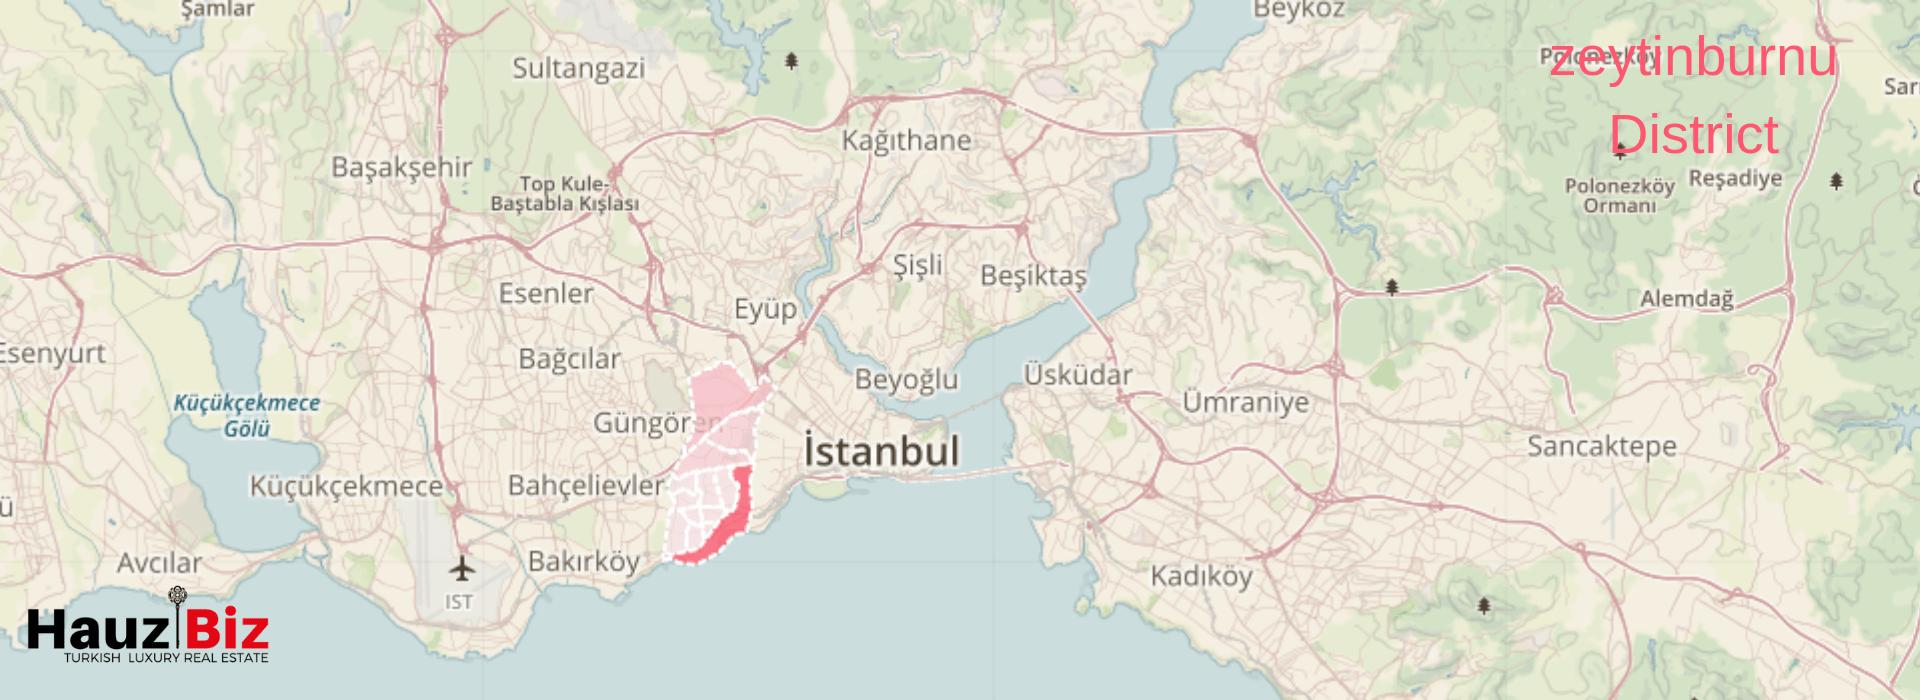 zeytinburnu map